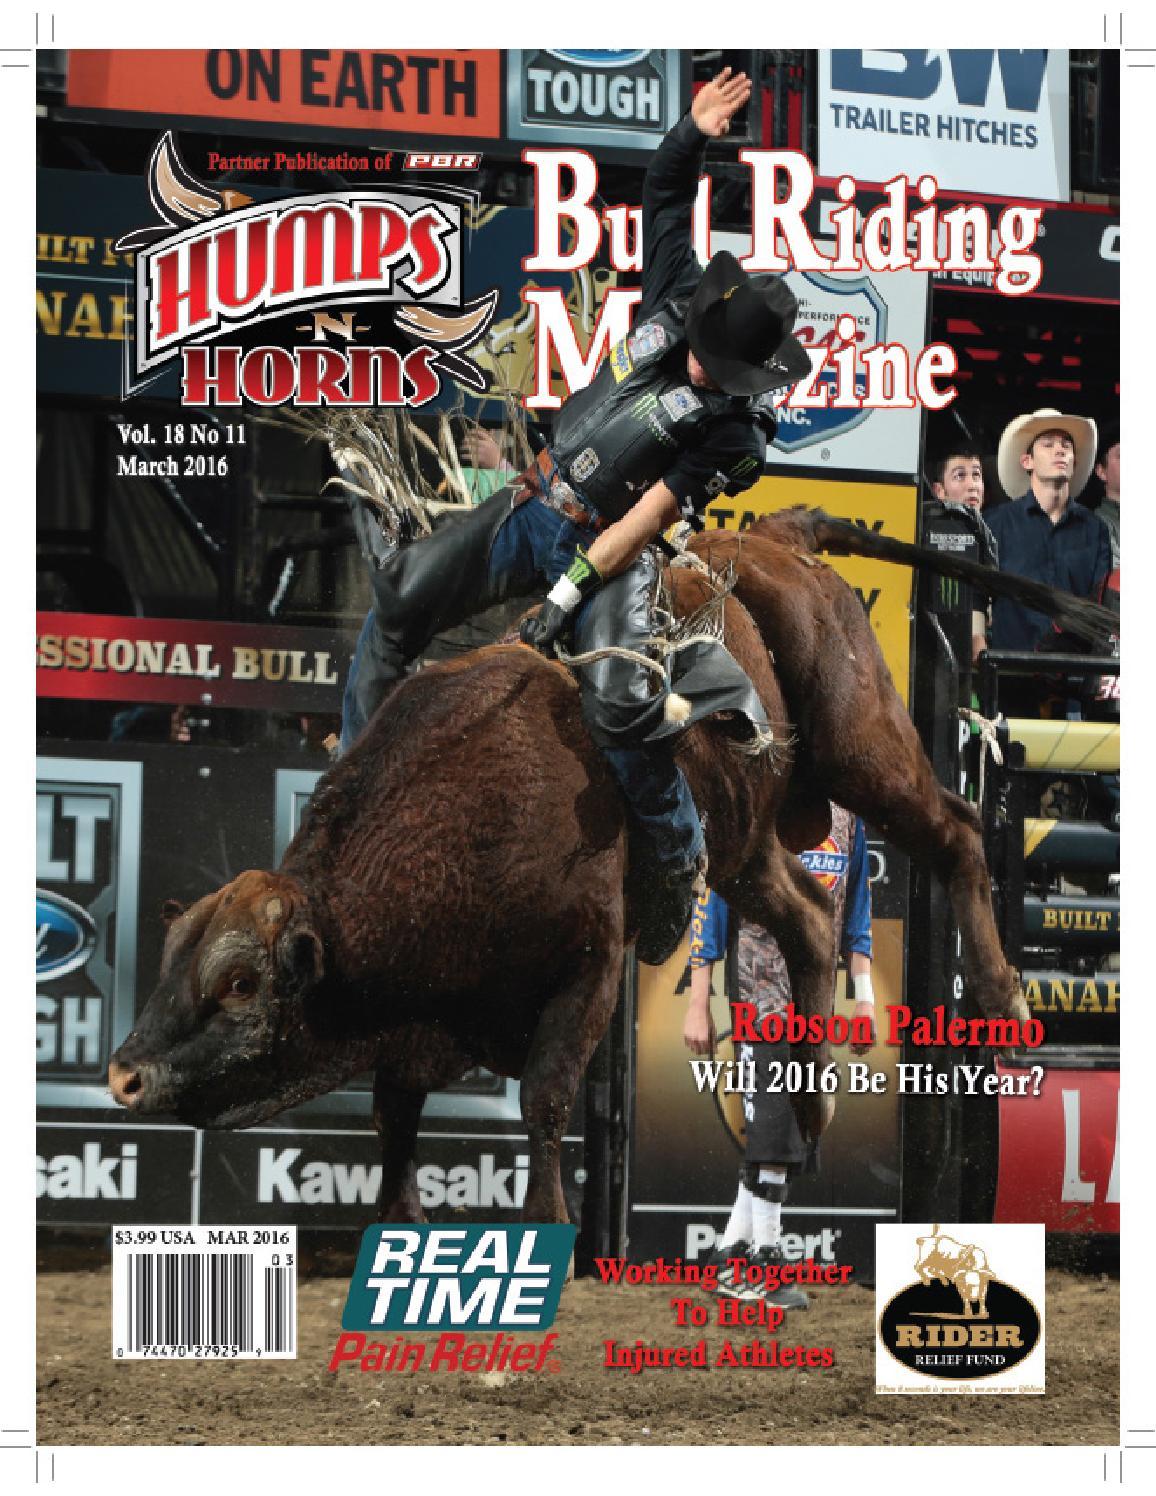 This little mutton - Humps N Horns Bull Riding Magazine